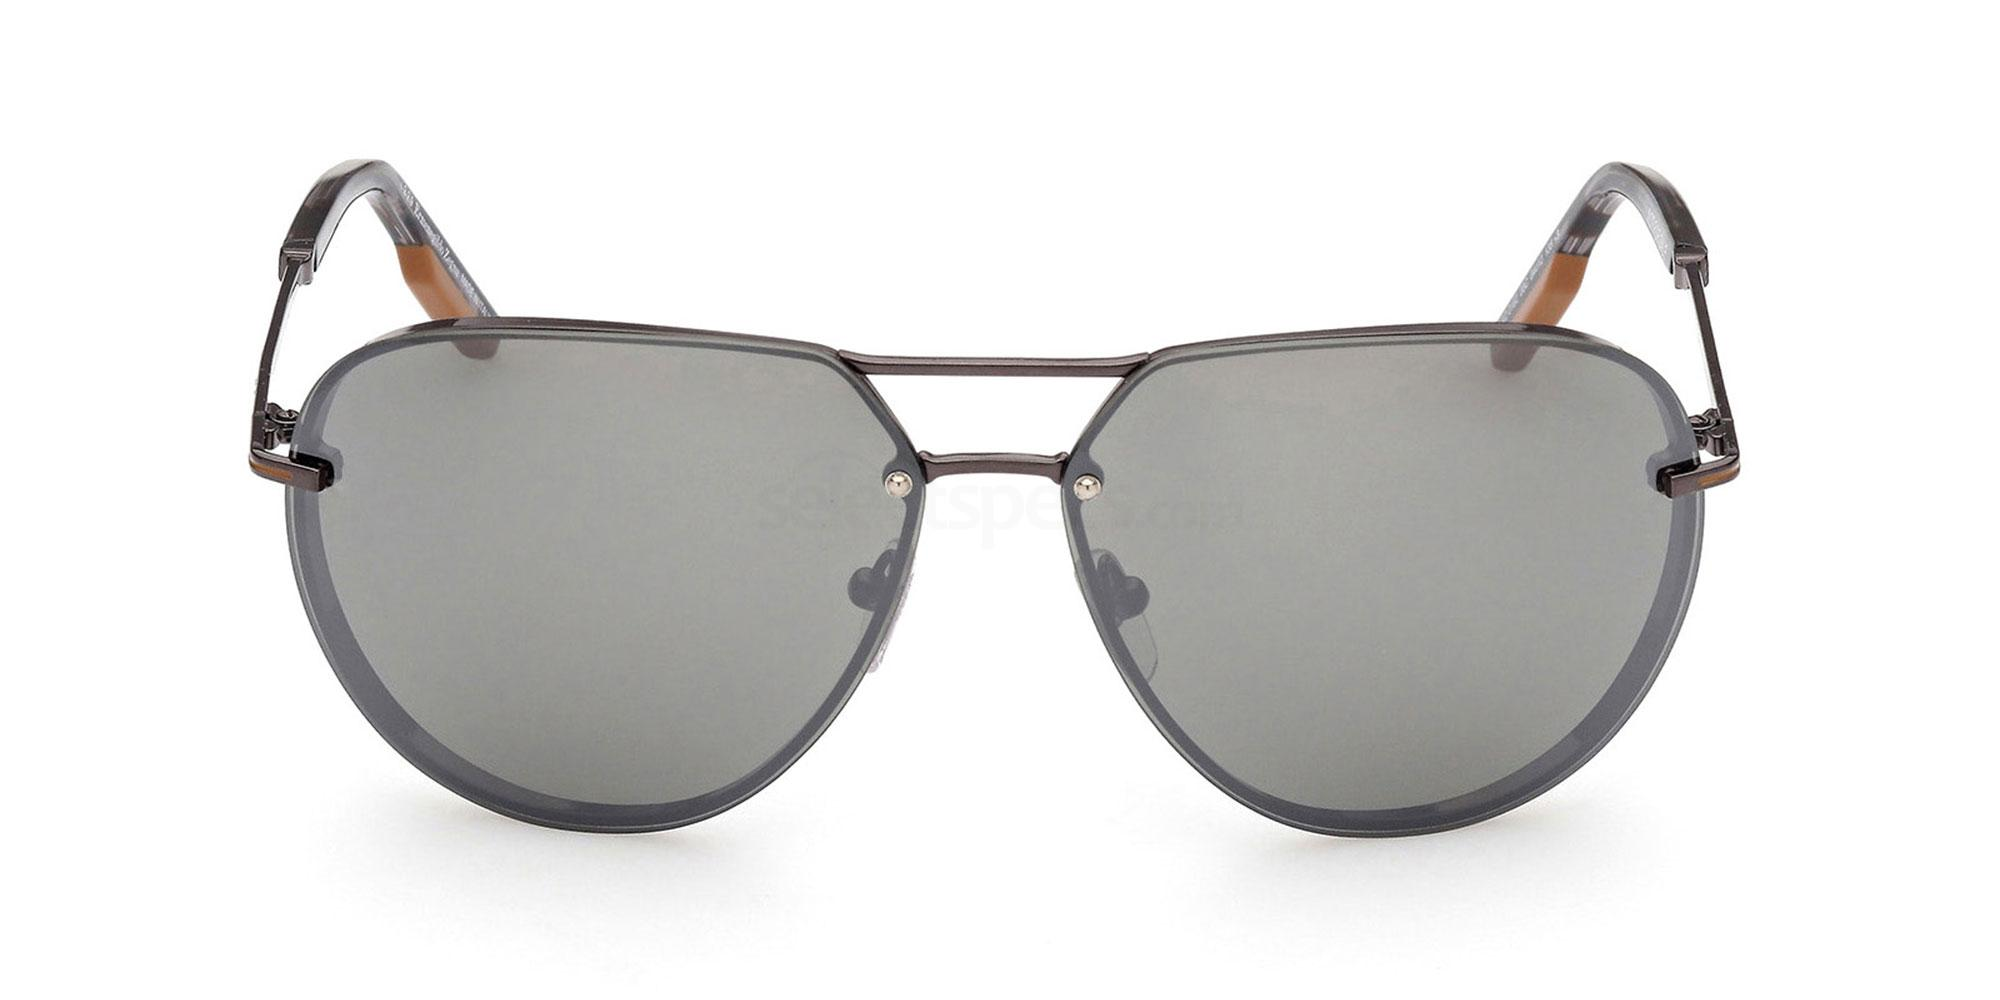 08C EZ0162 Sunglasses, Ermenegildo Zegna